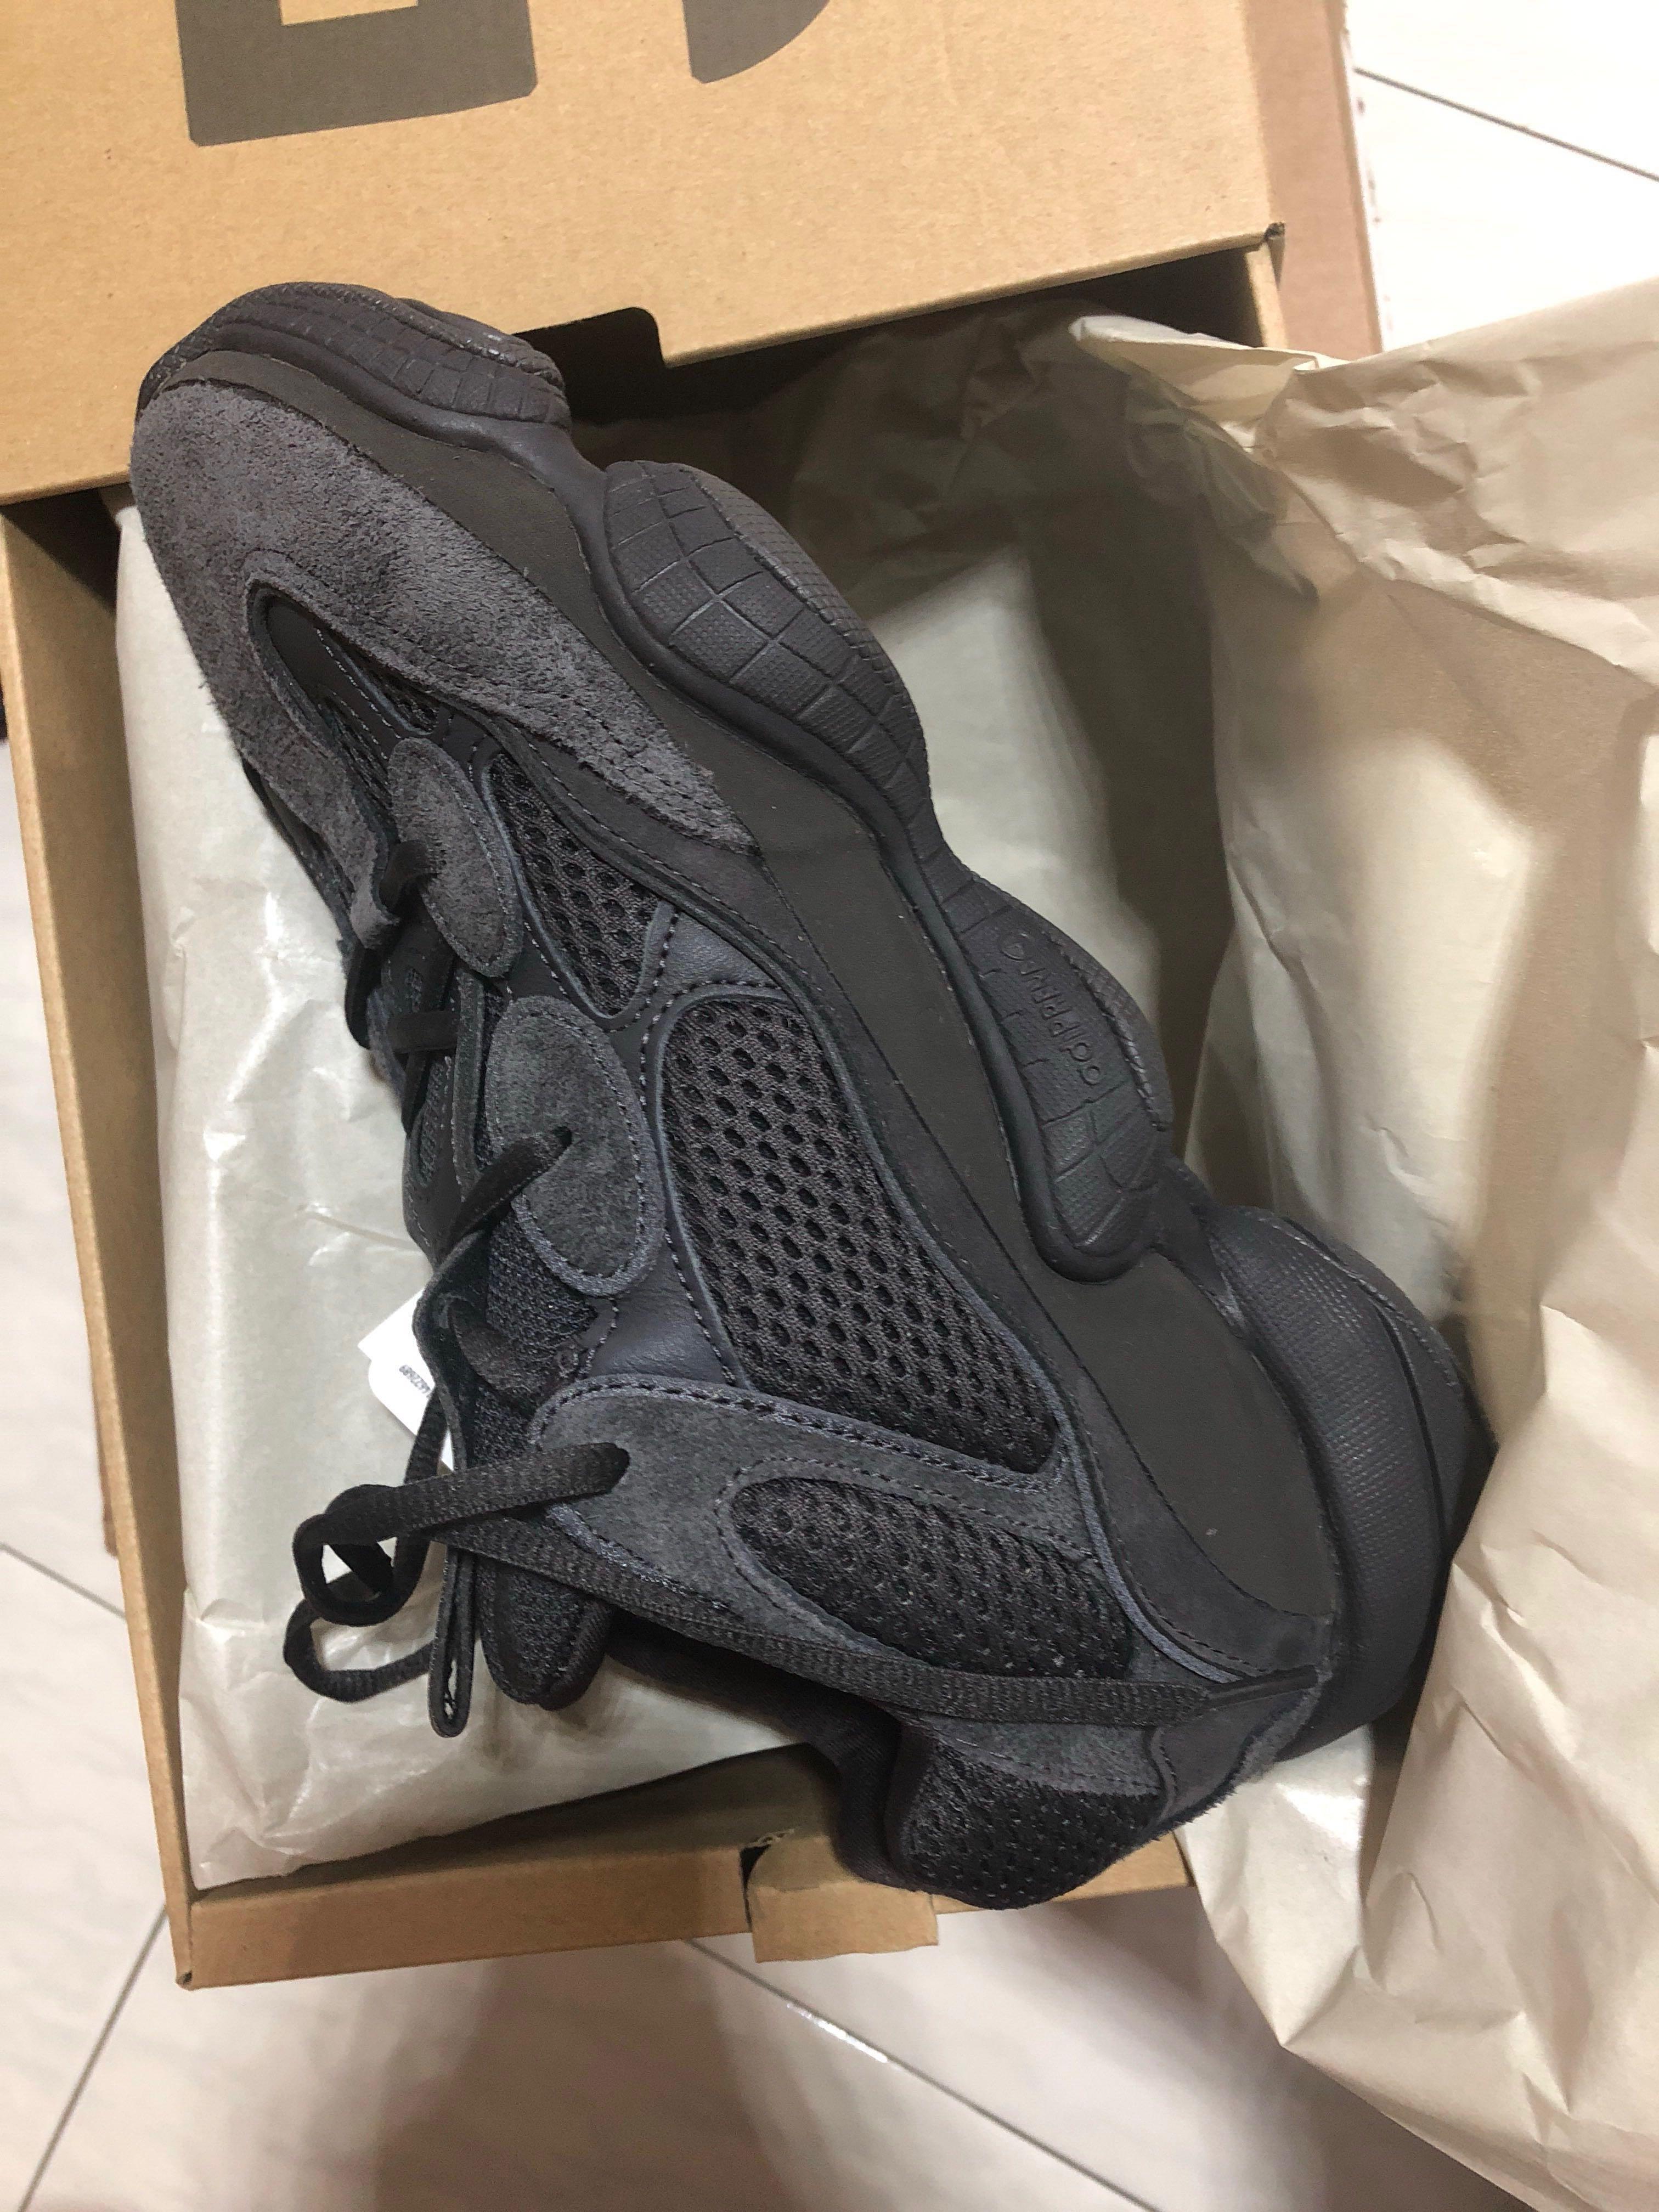 5cfa6379 adidas Originals x Kanye West Yeezy 500 F36640 Utility Black 7.5 ...